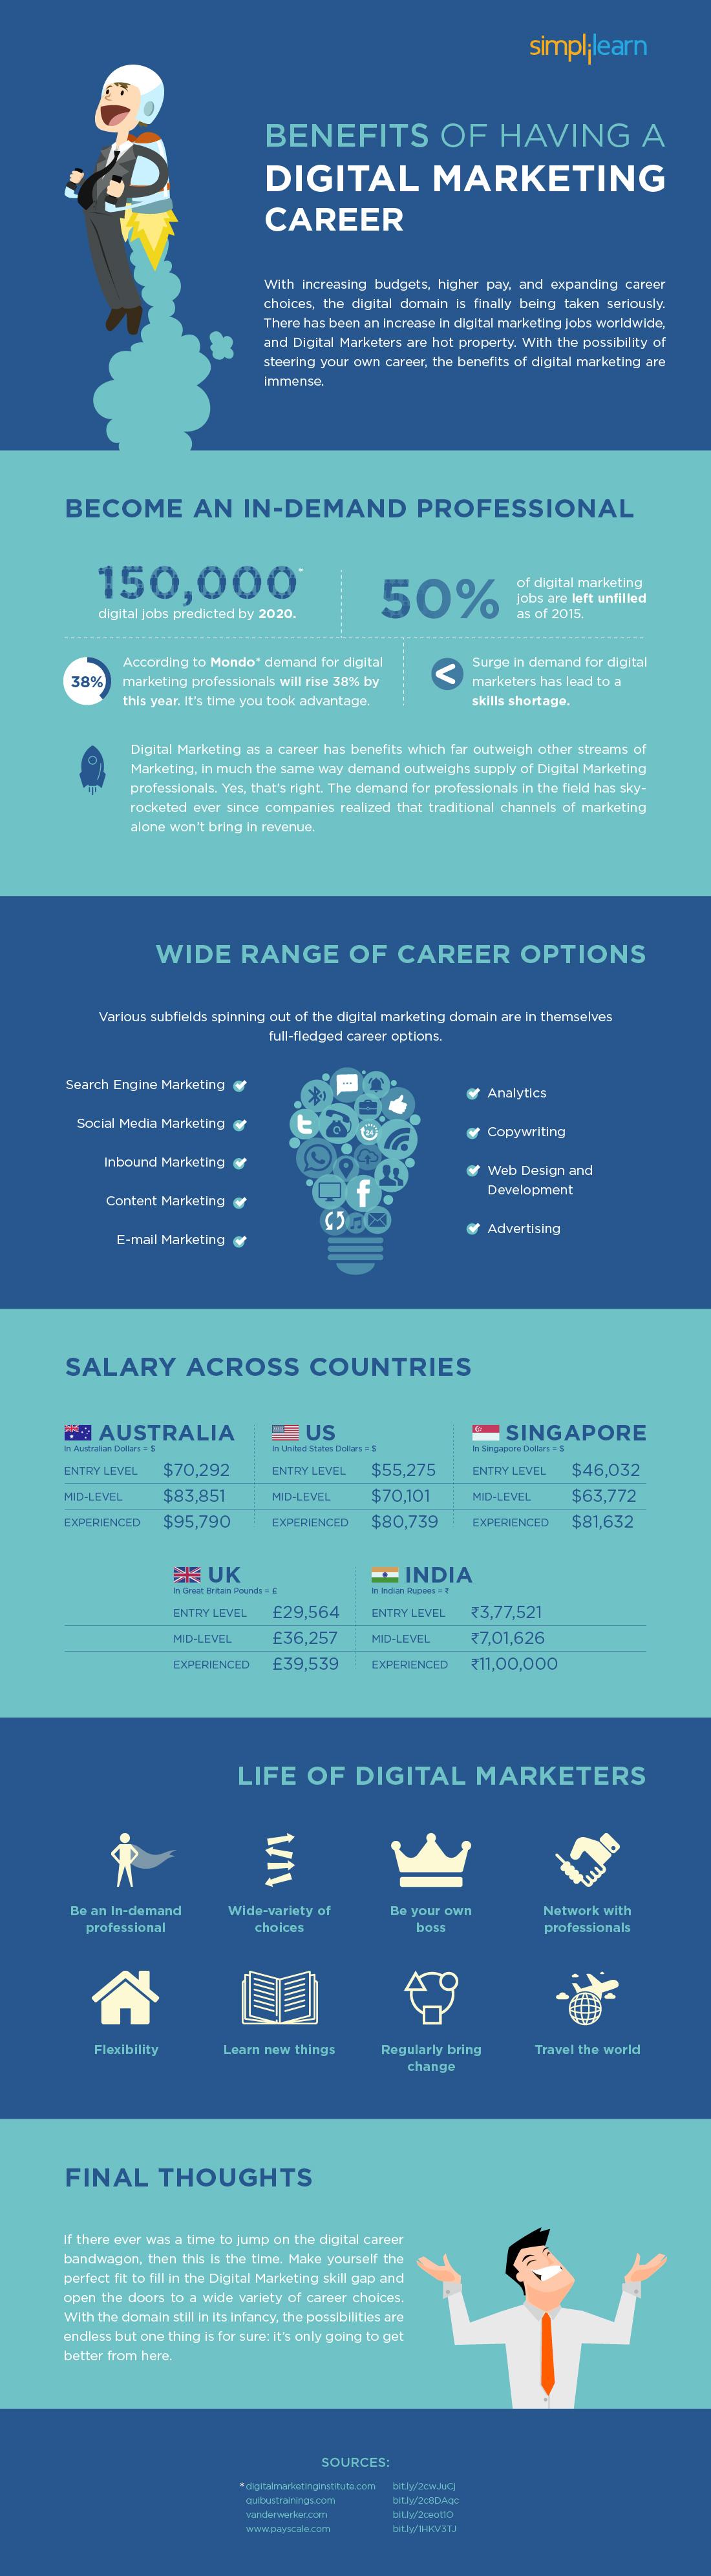 benefits-of-having-a-career-in-digital-marketing